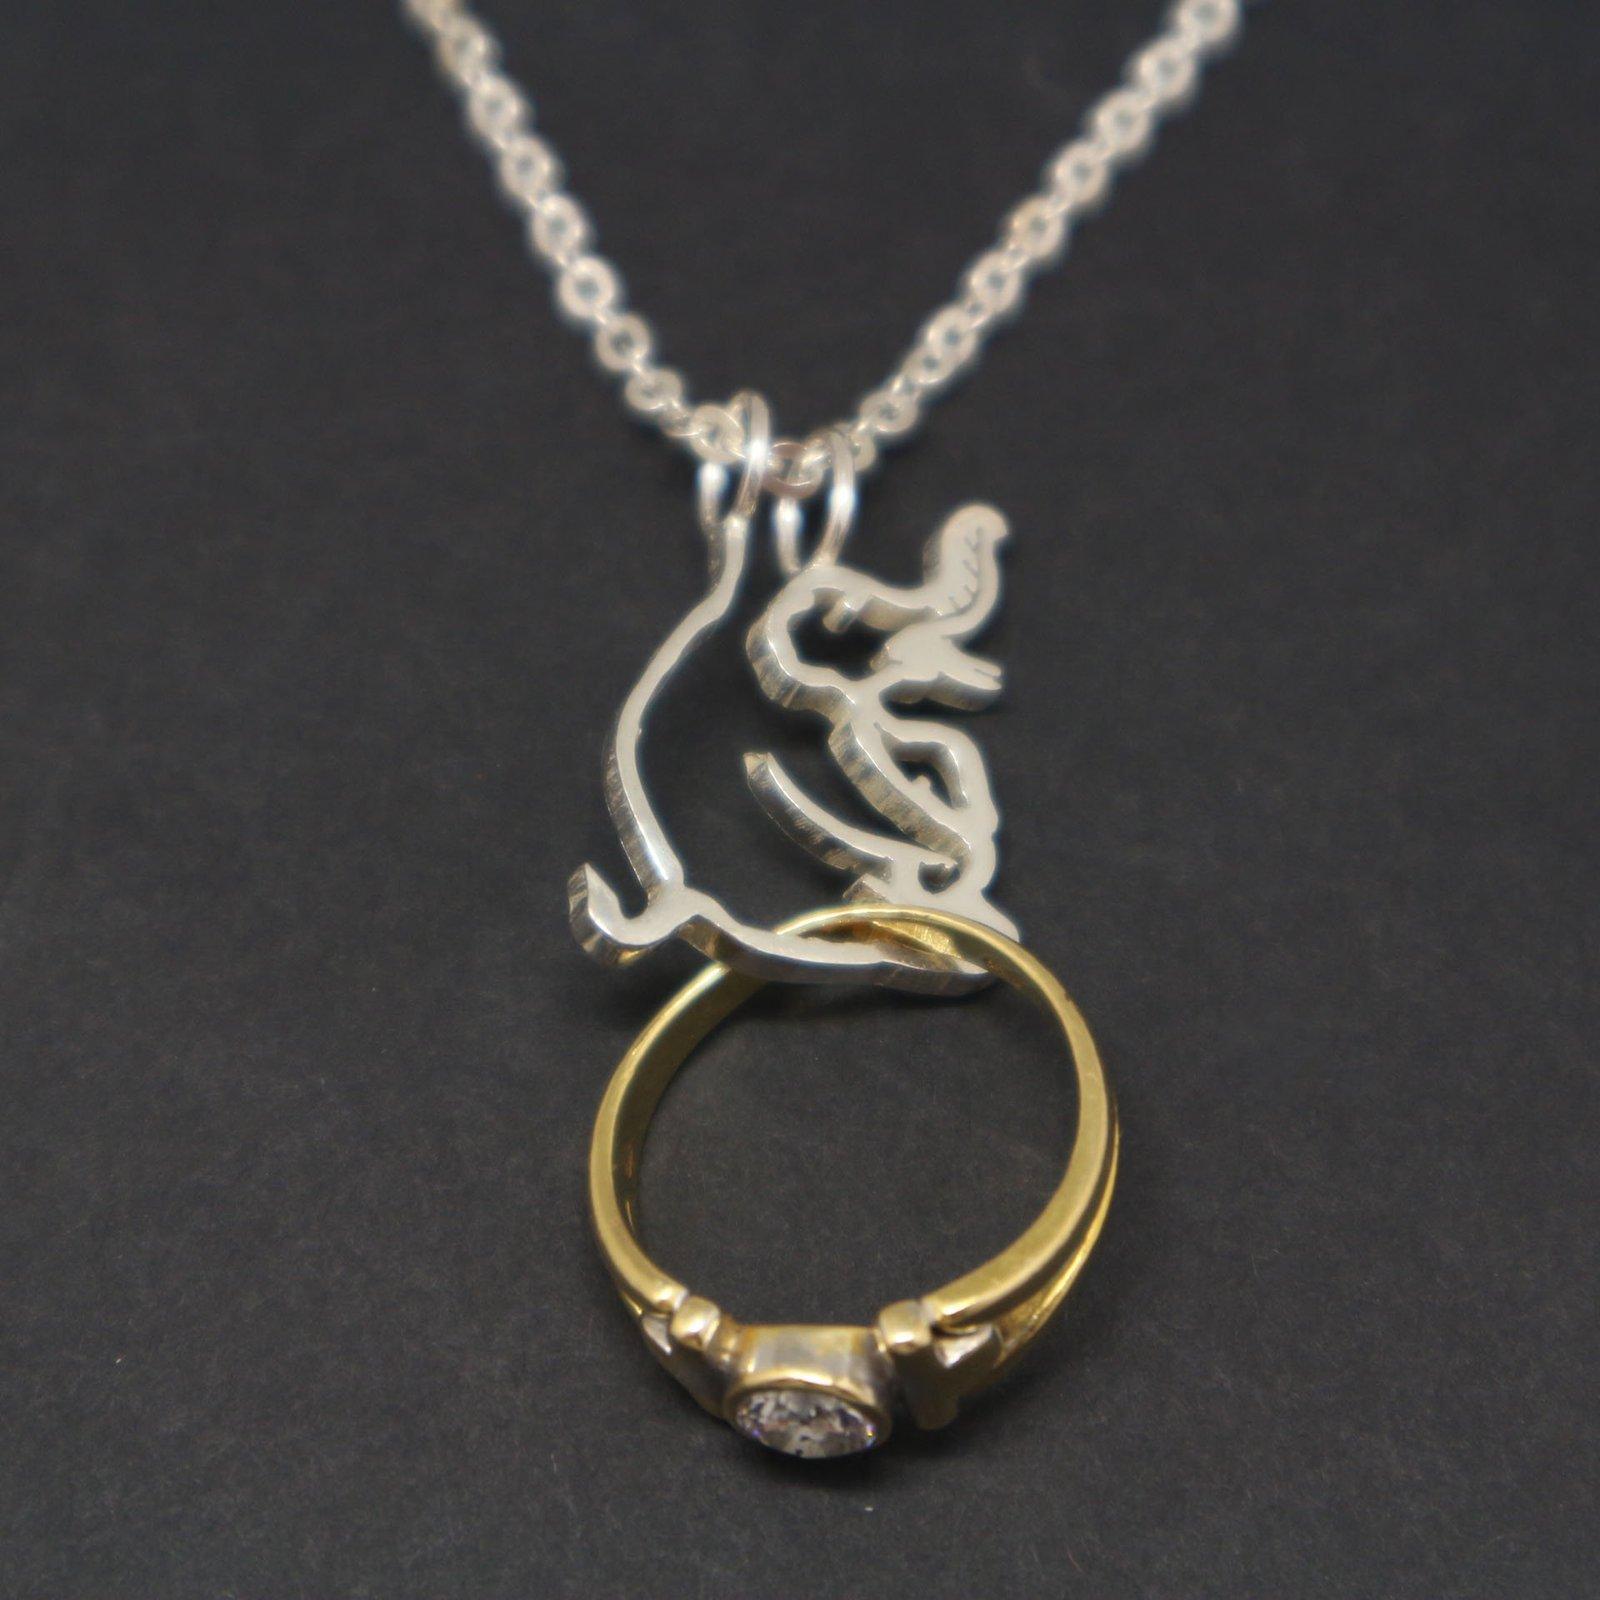 Silver Elephant Ring Holder Necklace Pendant